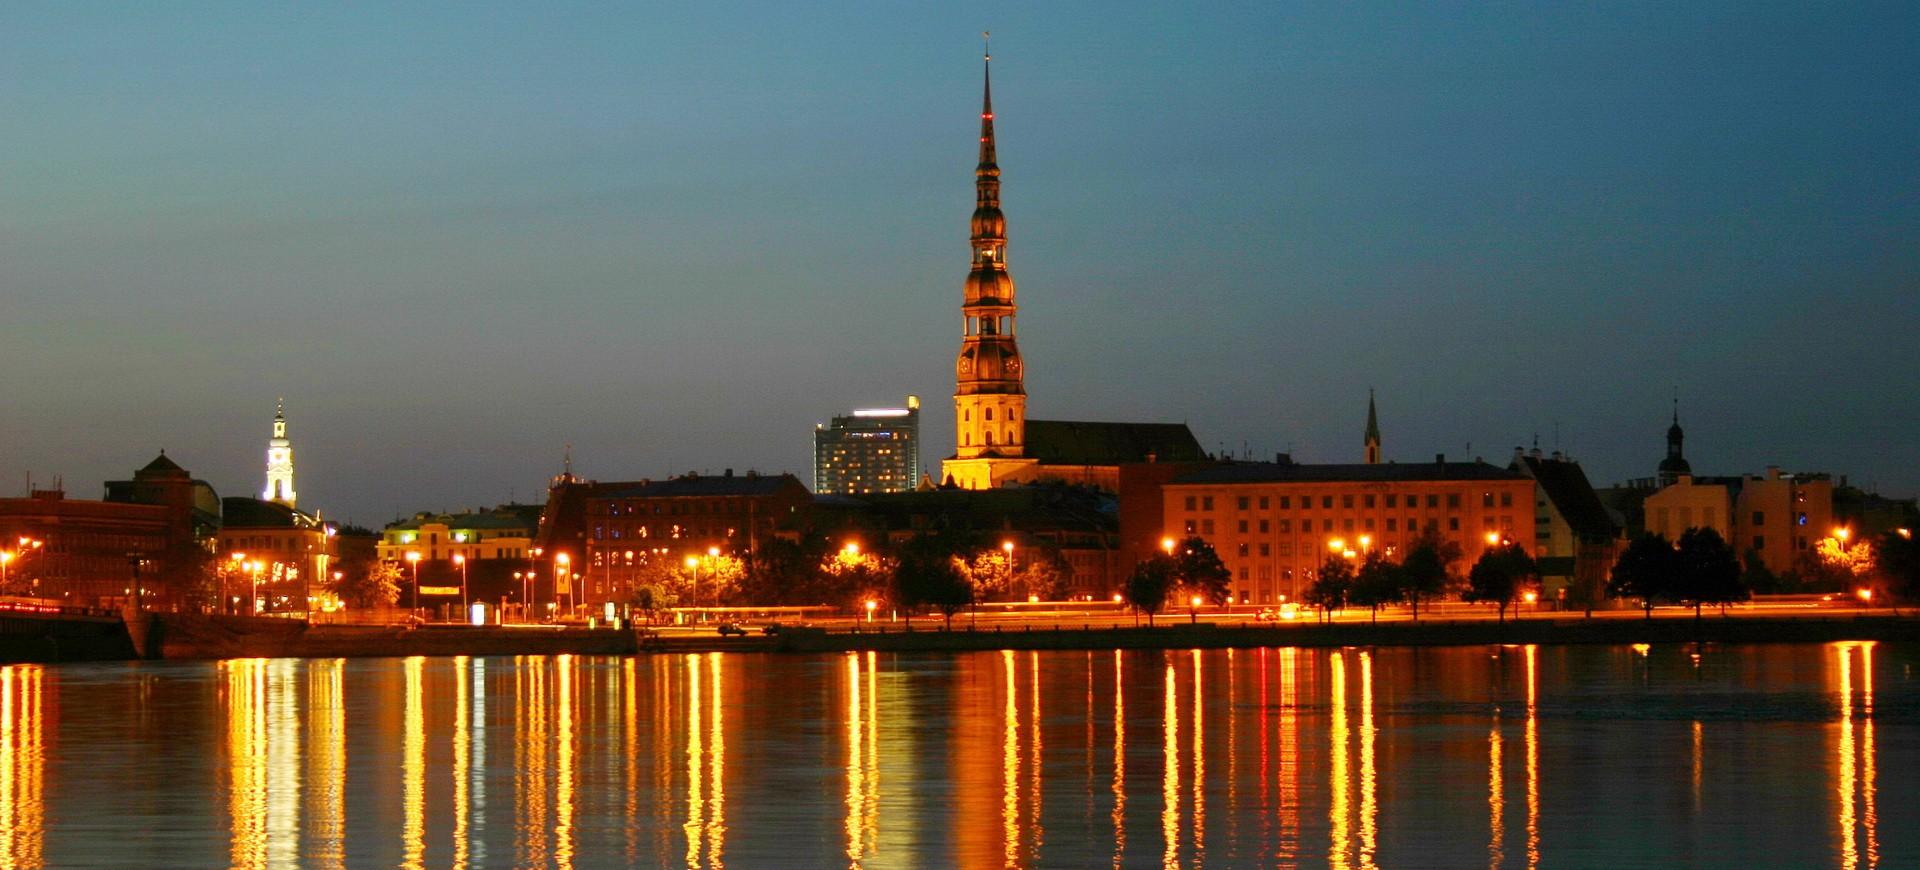 Riga by night en Lettoni aux Pays Baltes